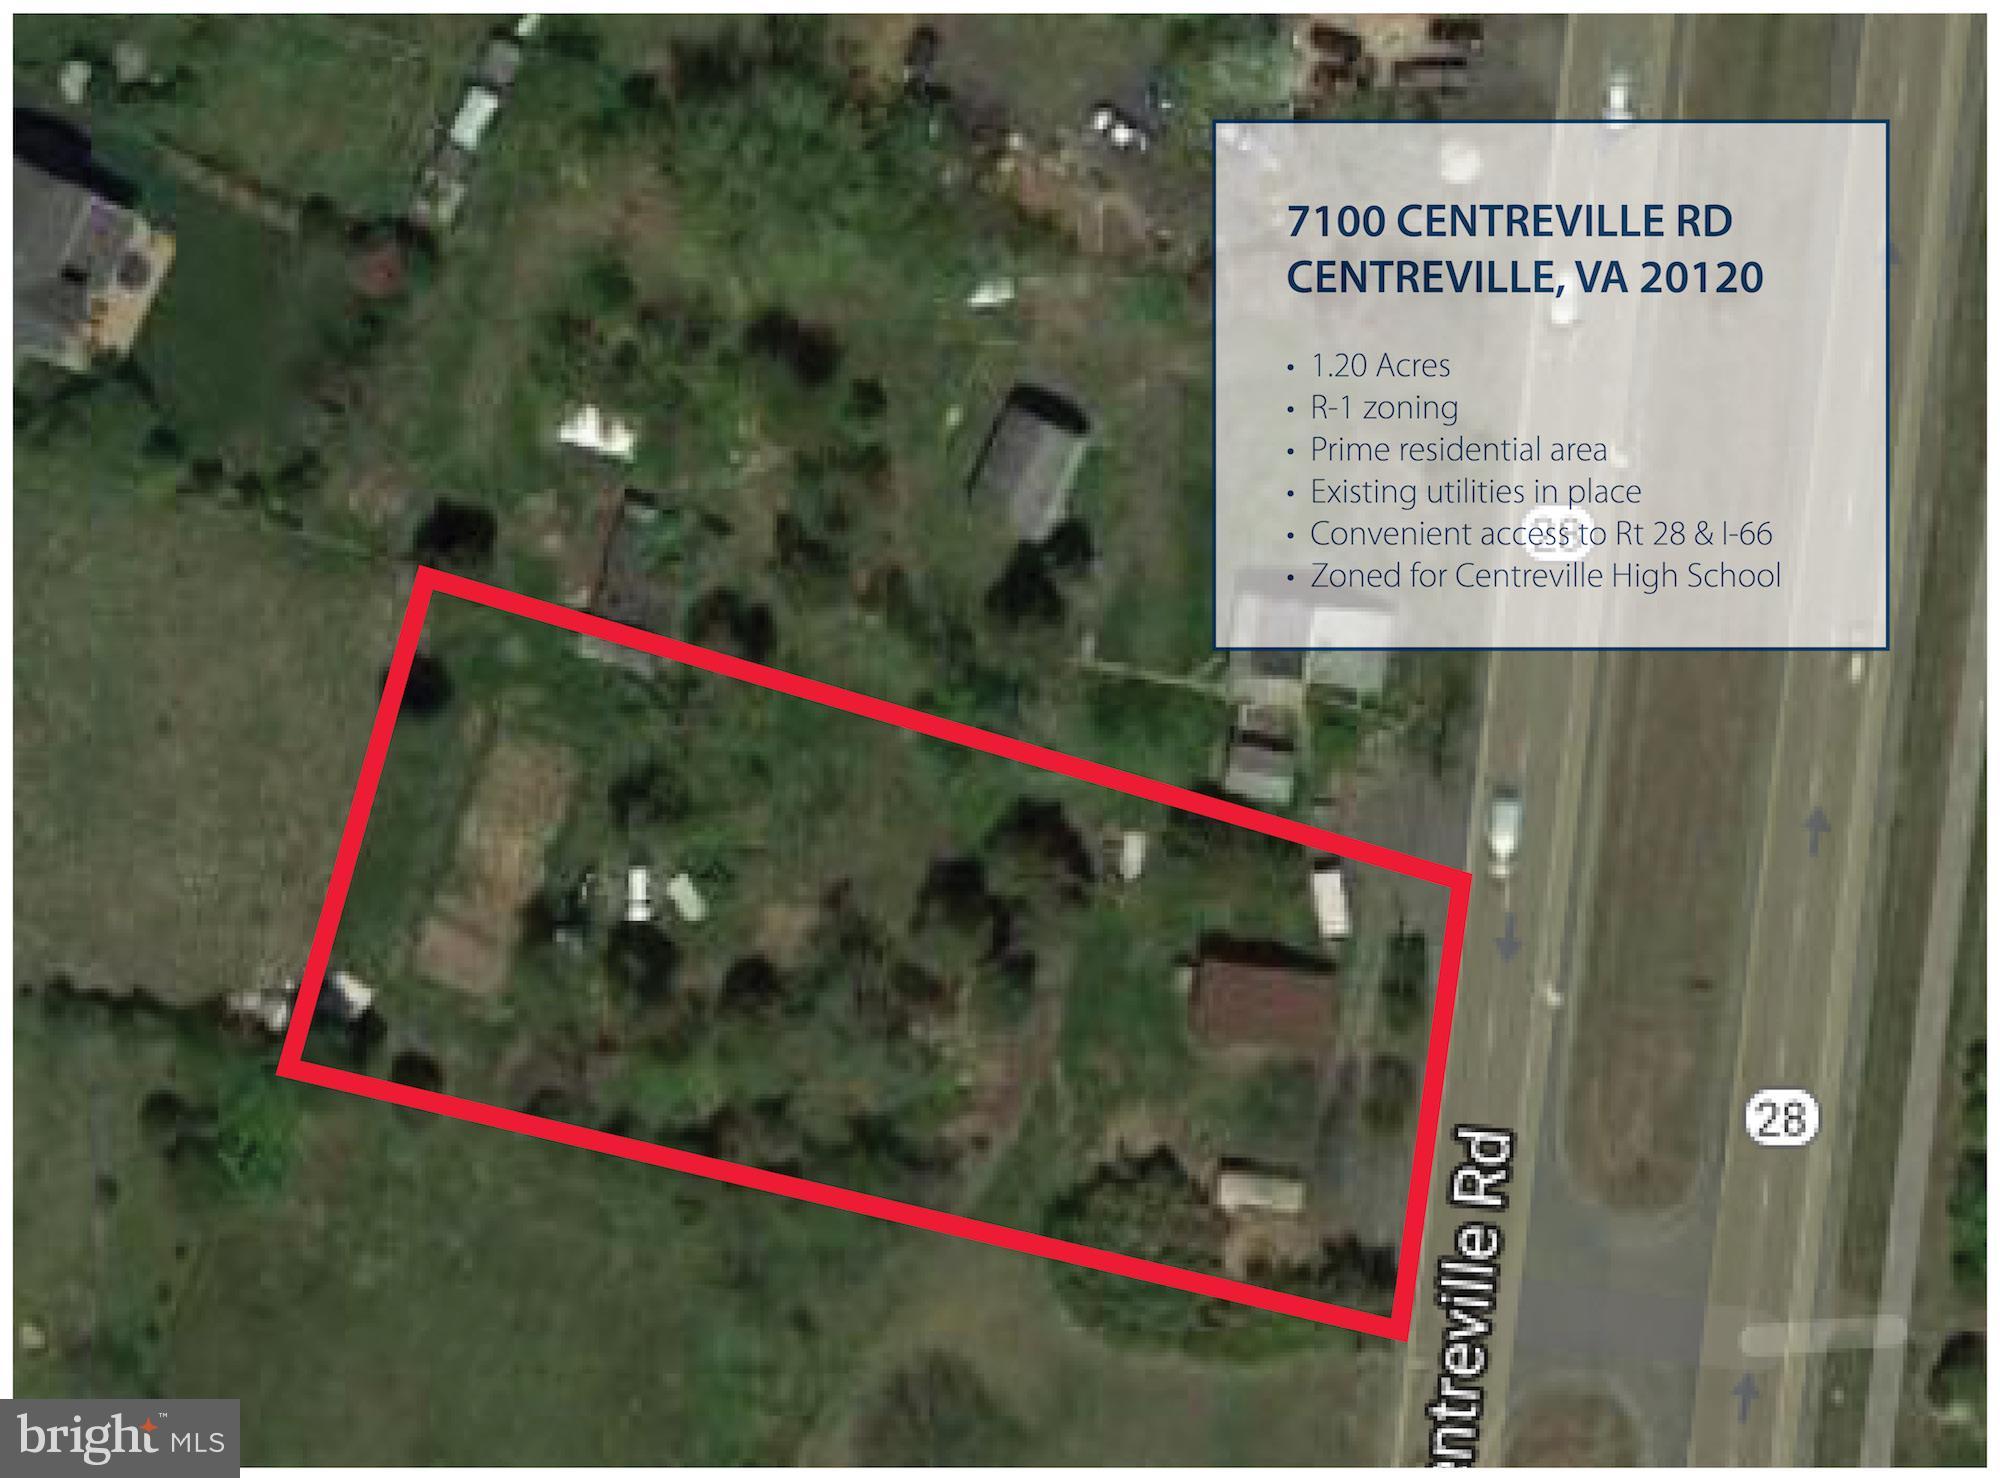 7100 Centreville, Centreville, VA, 20120